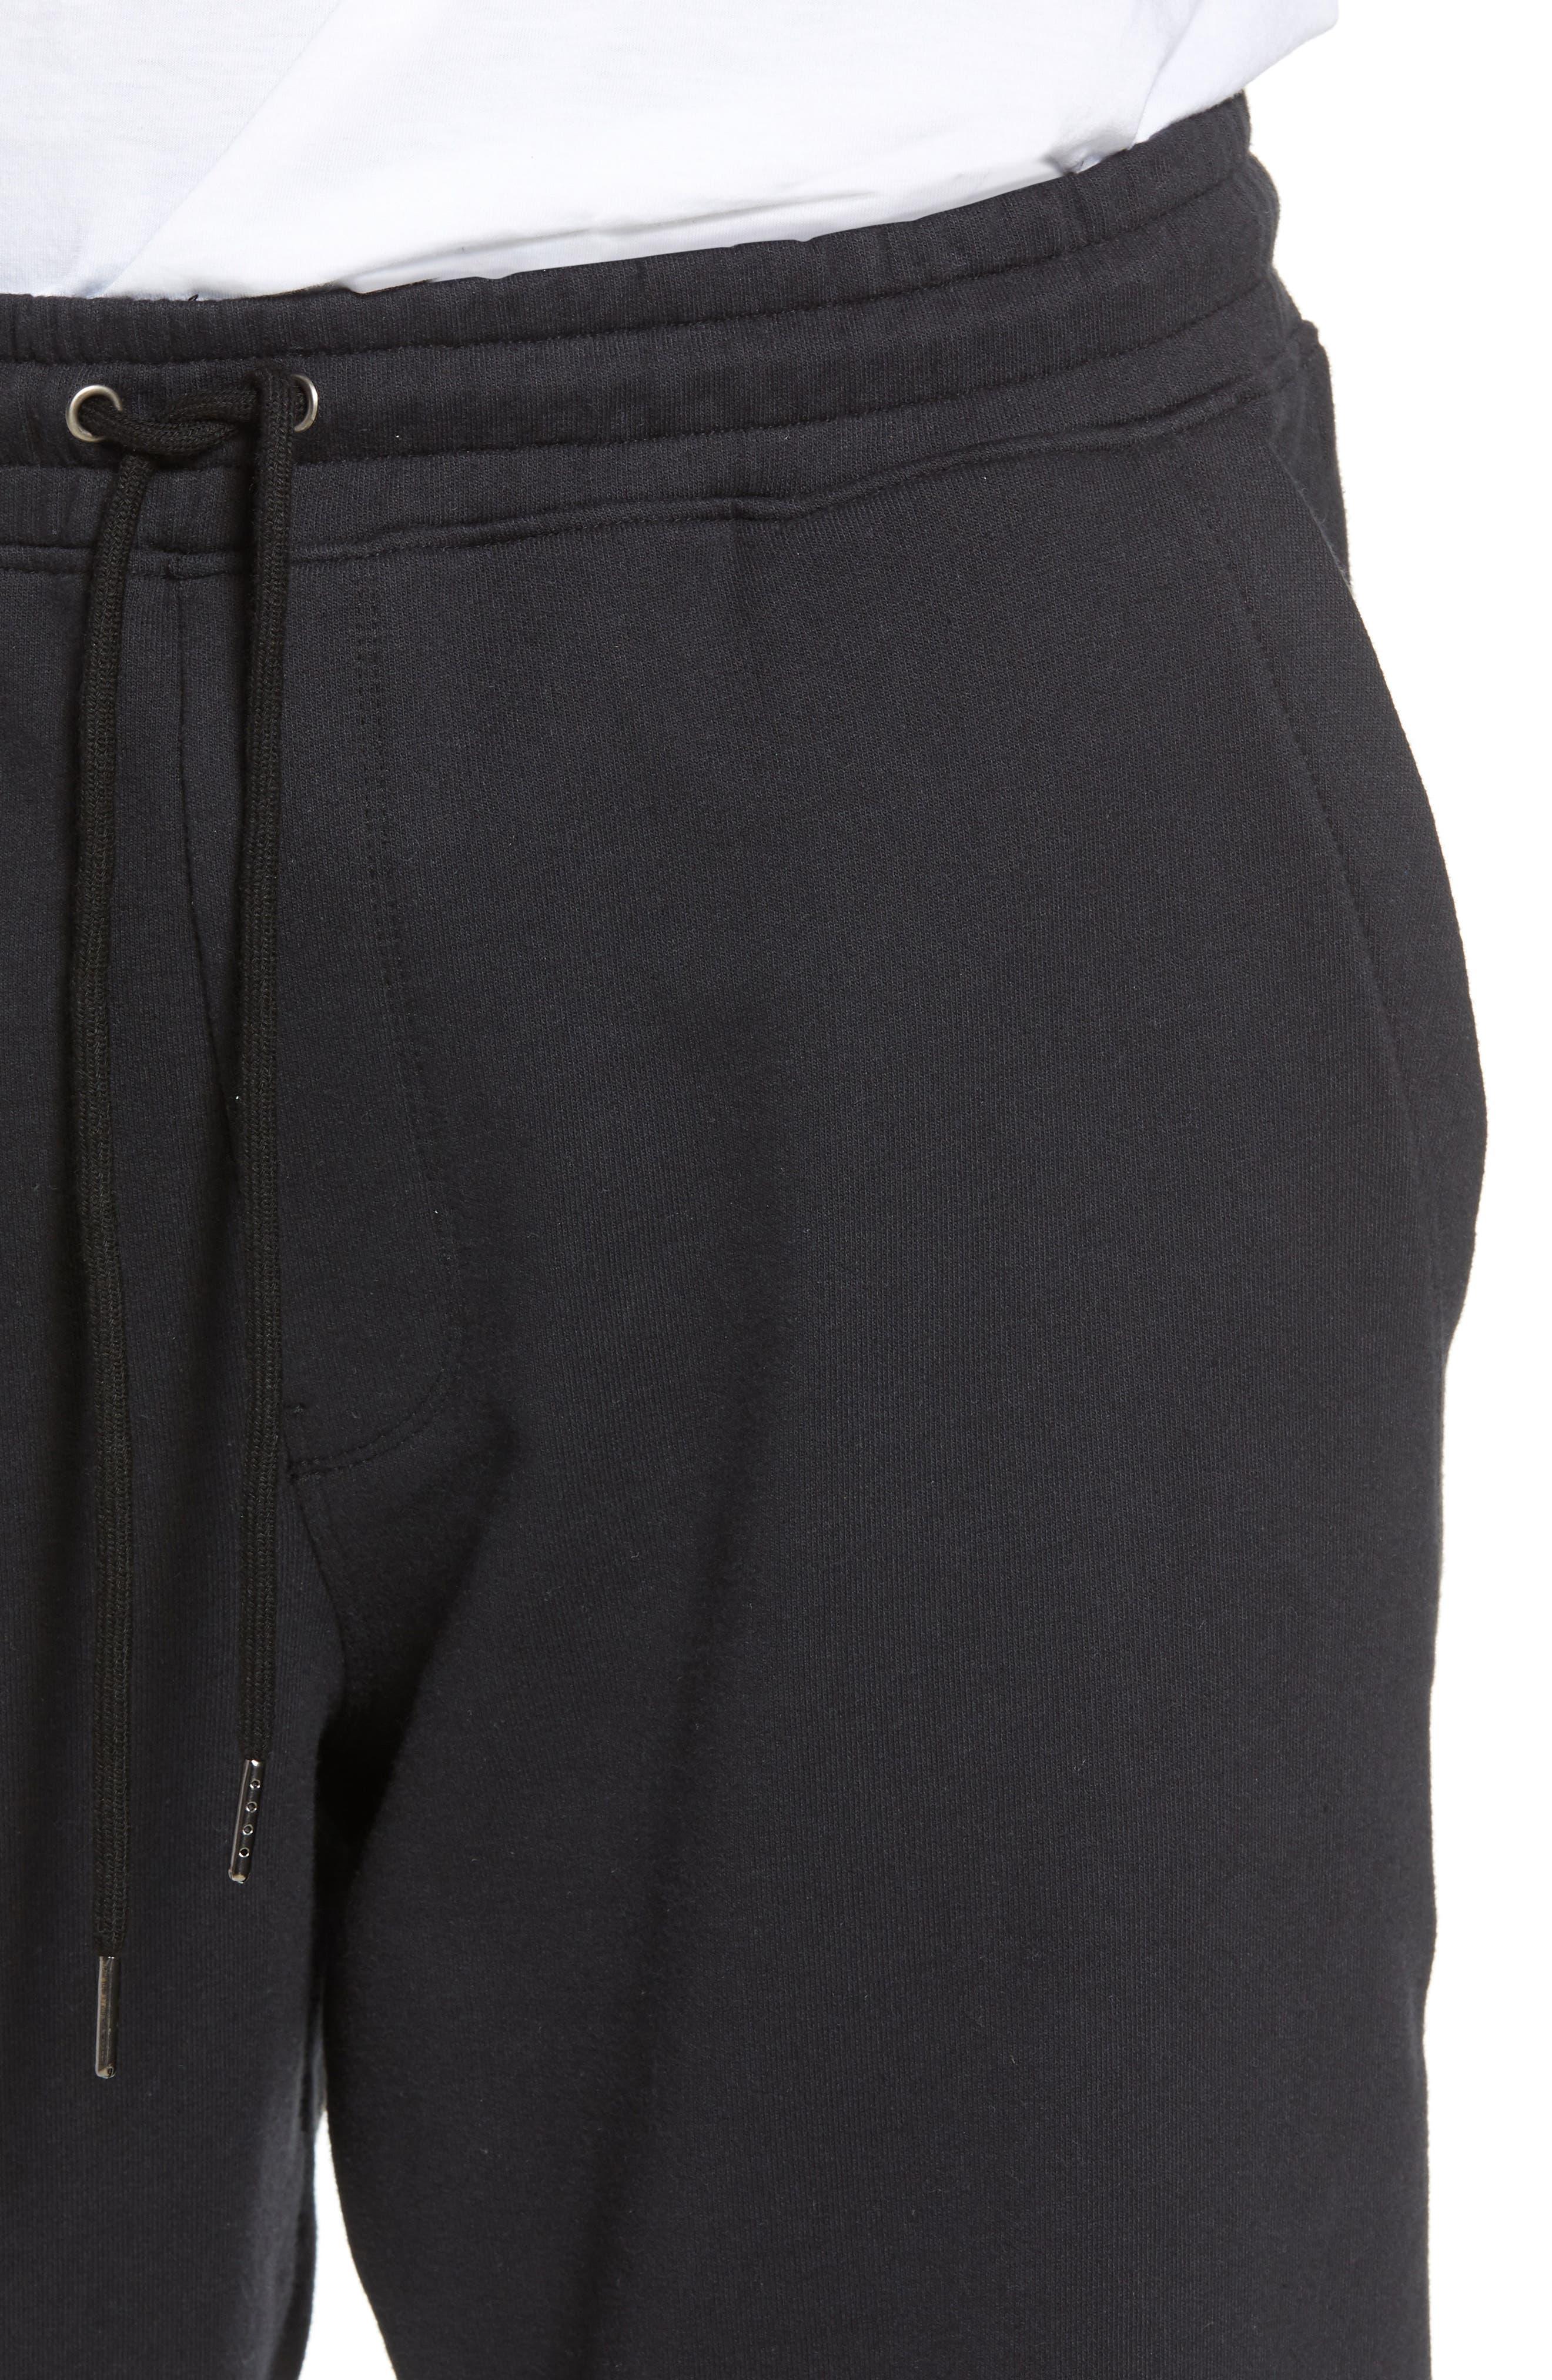 Cropped Sweatpants,                             Alternate thumbnail 4, color,                             001